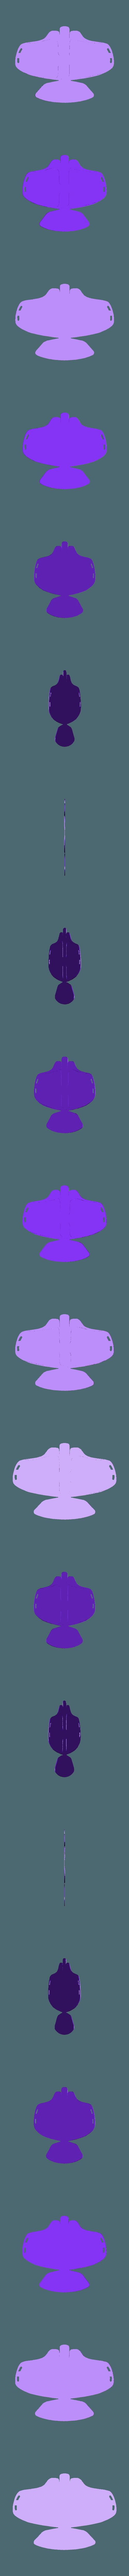 mascarilla mark 4 (thick).stl Download free STL file Mask 3D NanoHack Improved (MassProductionVersion) • 3D printing model, Tonystark112